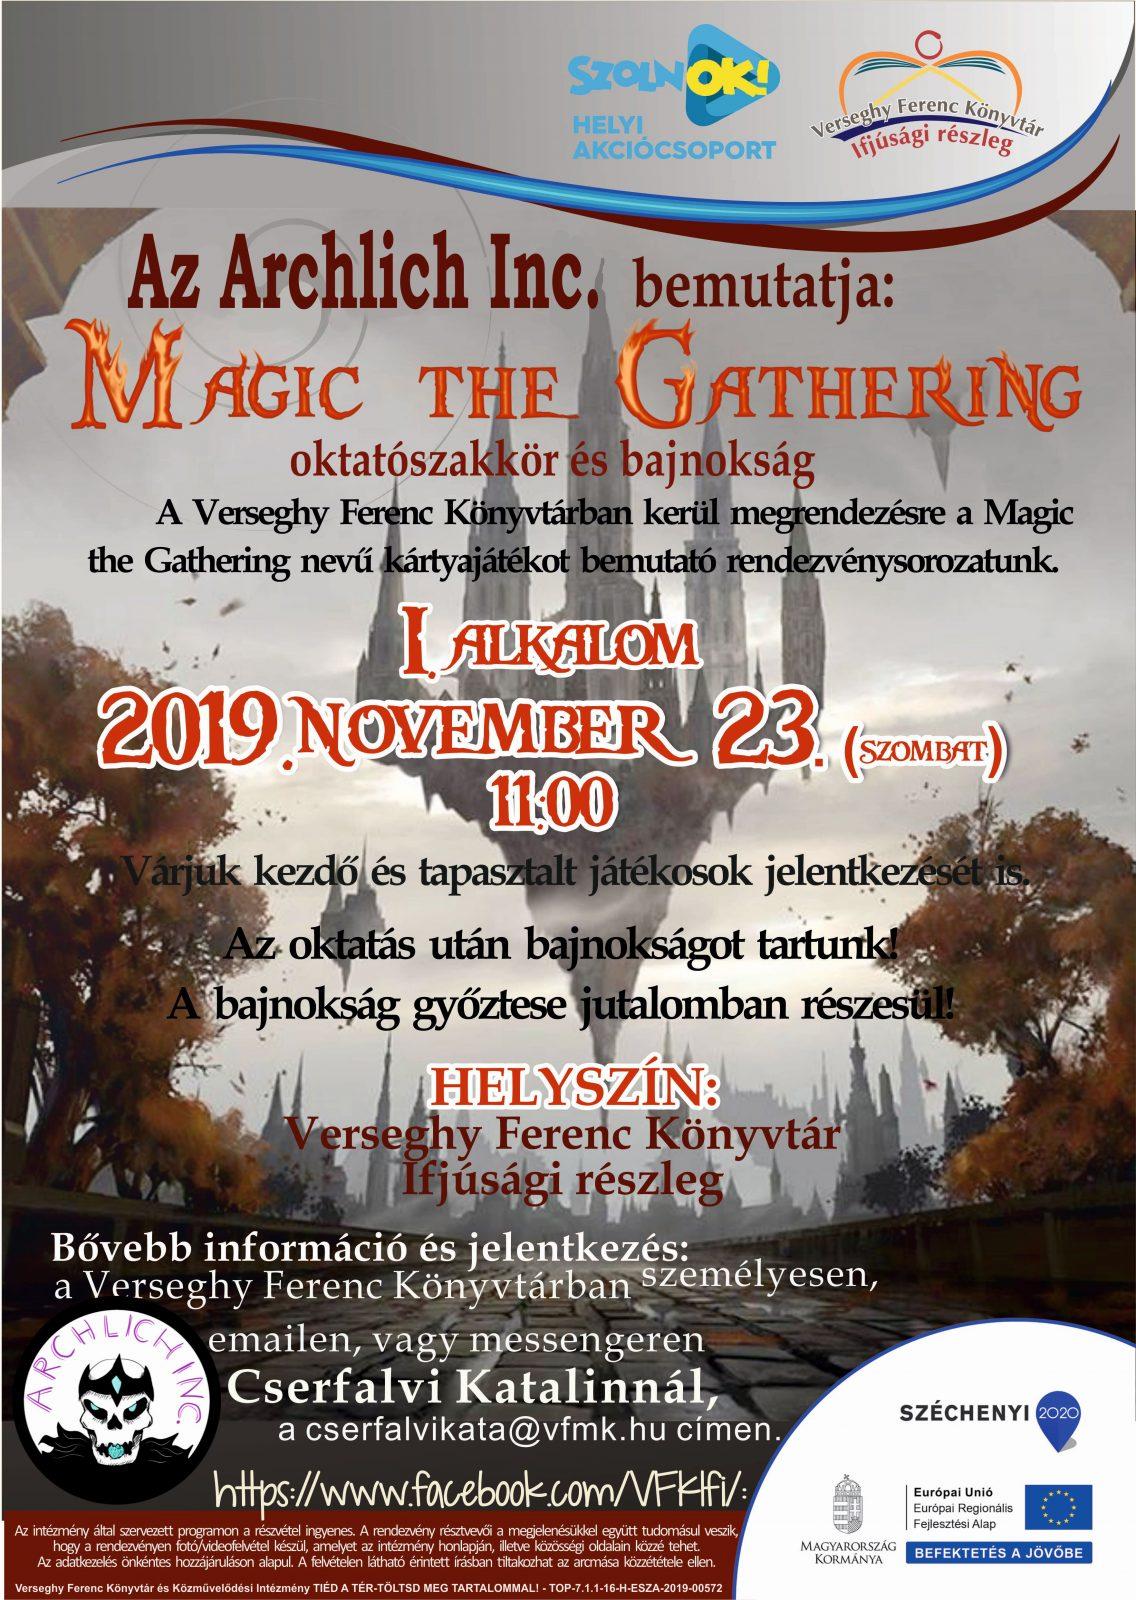 2019.11.23. Archlich. Magic the Gathering bemutató. Plakát.